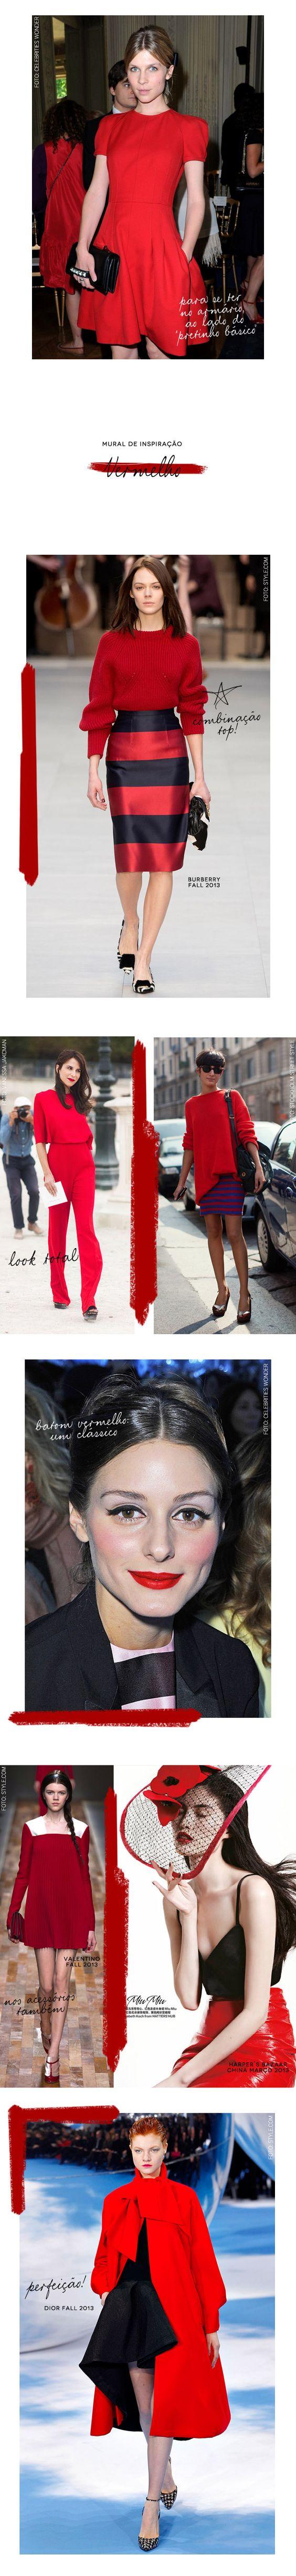 fashion-gazette-barbara-resende-tendencia-mural-inspiracao-vermelho